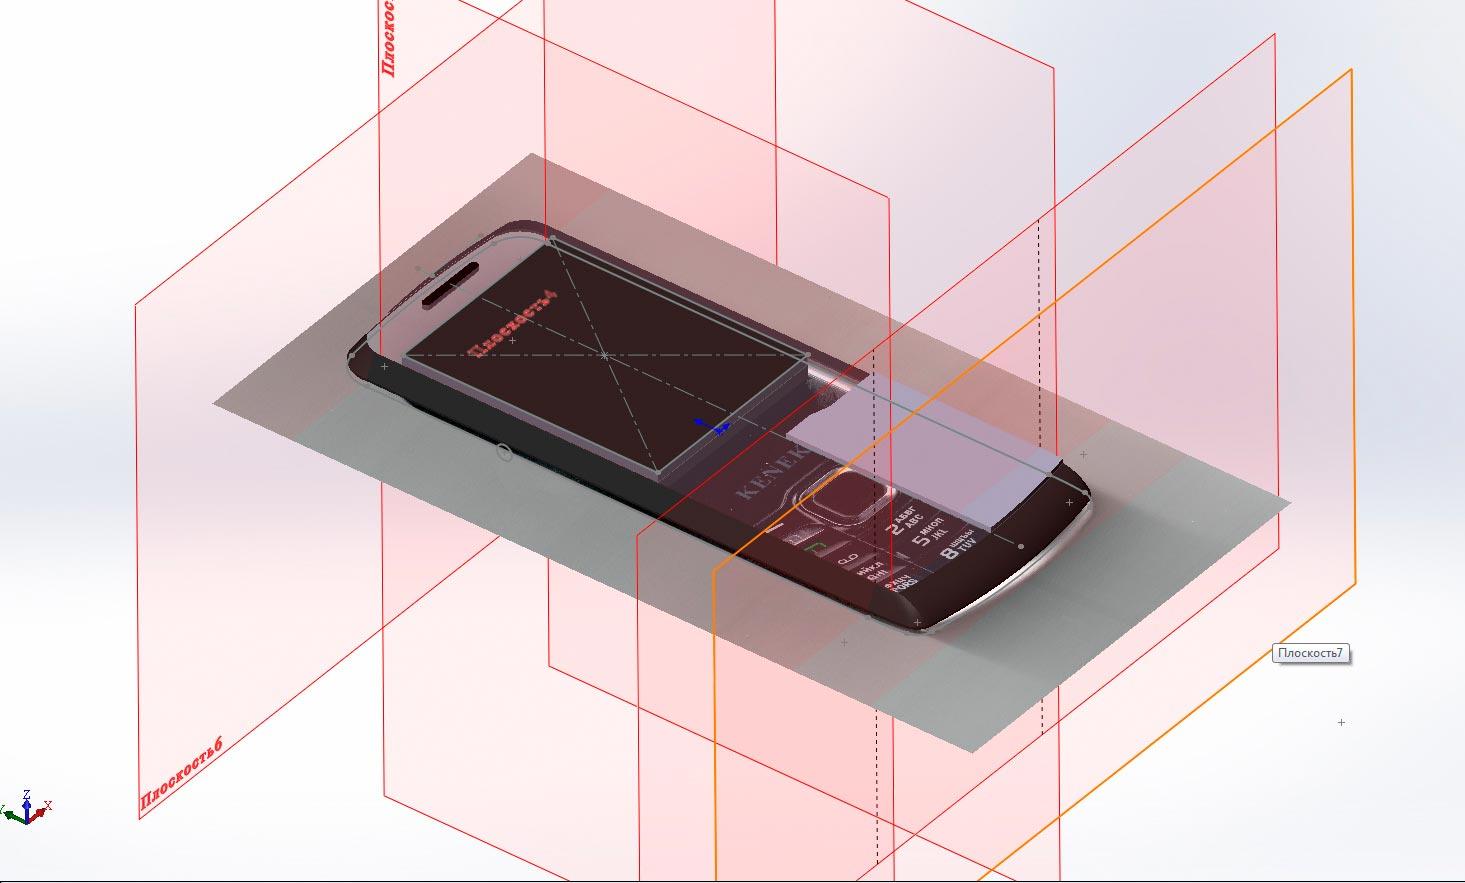 Создание 3д-модели телефона